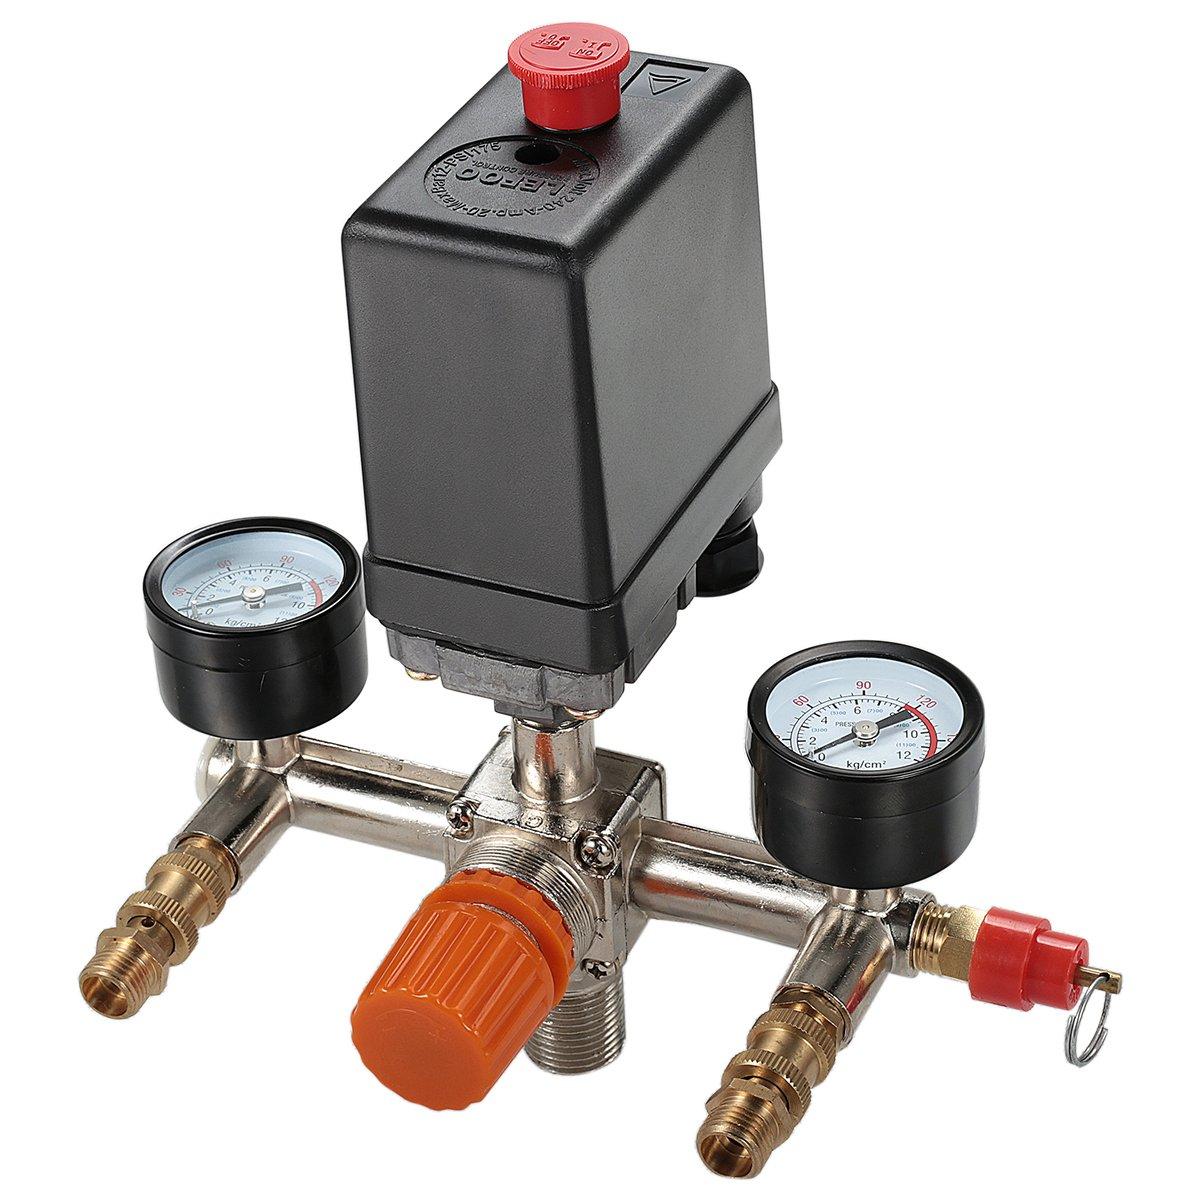 Secbolt Pressure Switch Manifold Regulator Gauges Air Compressor Pressure Switch Control Valve 90-120PSI (Vertical Switch) - - Amazon.com